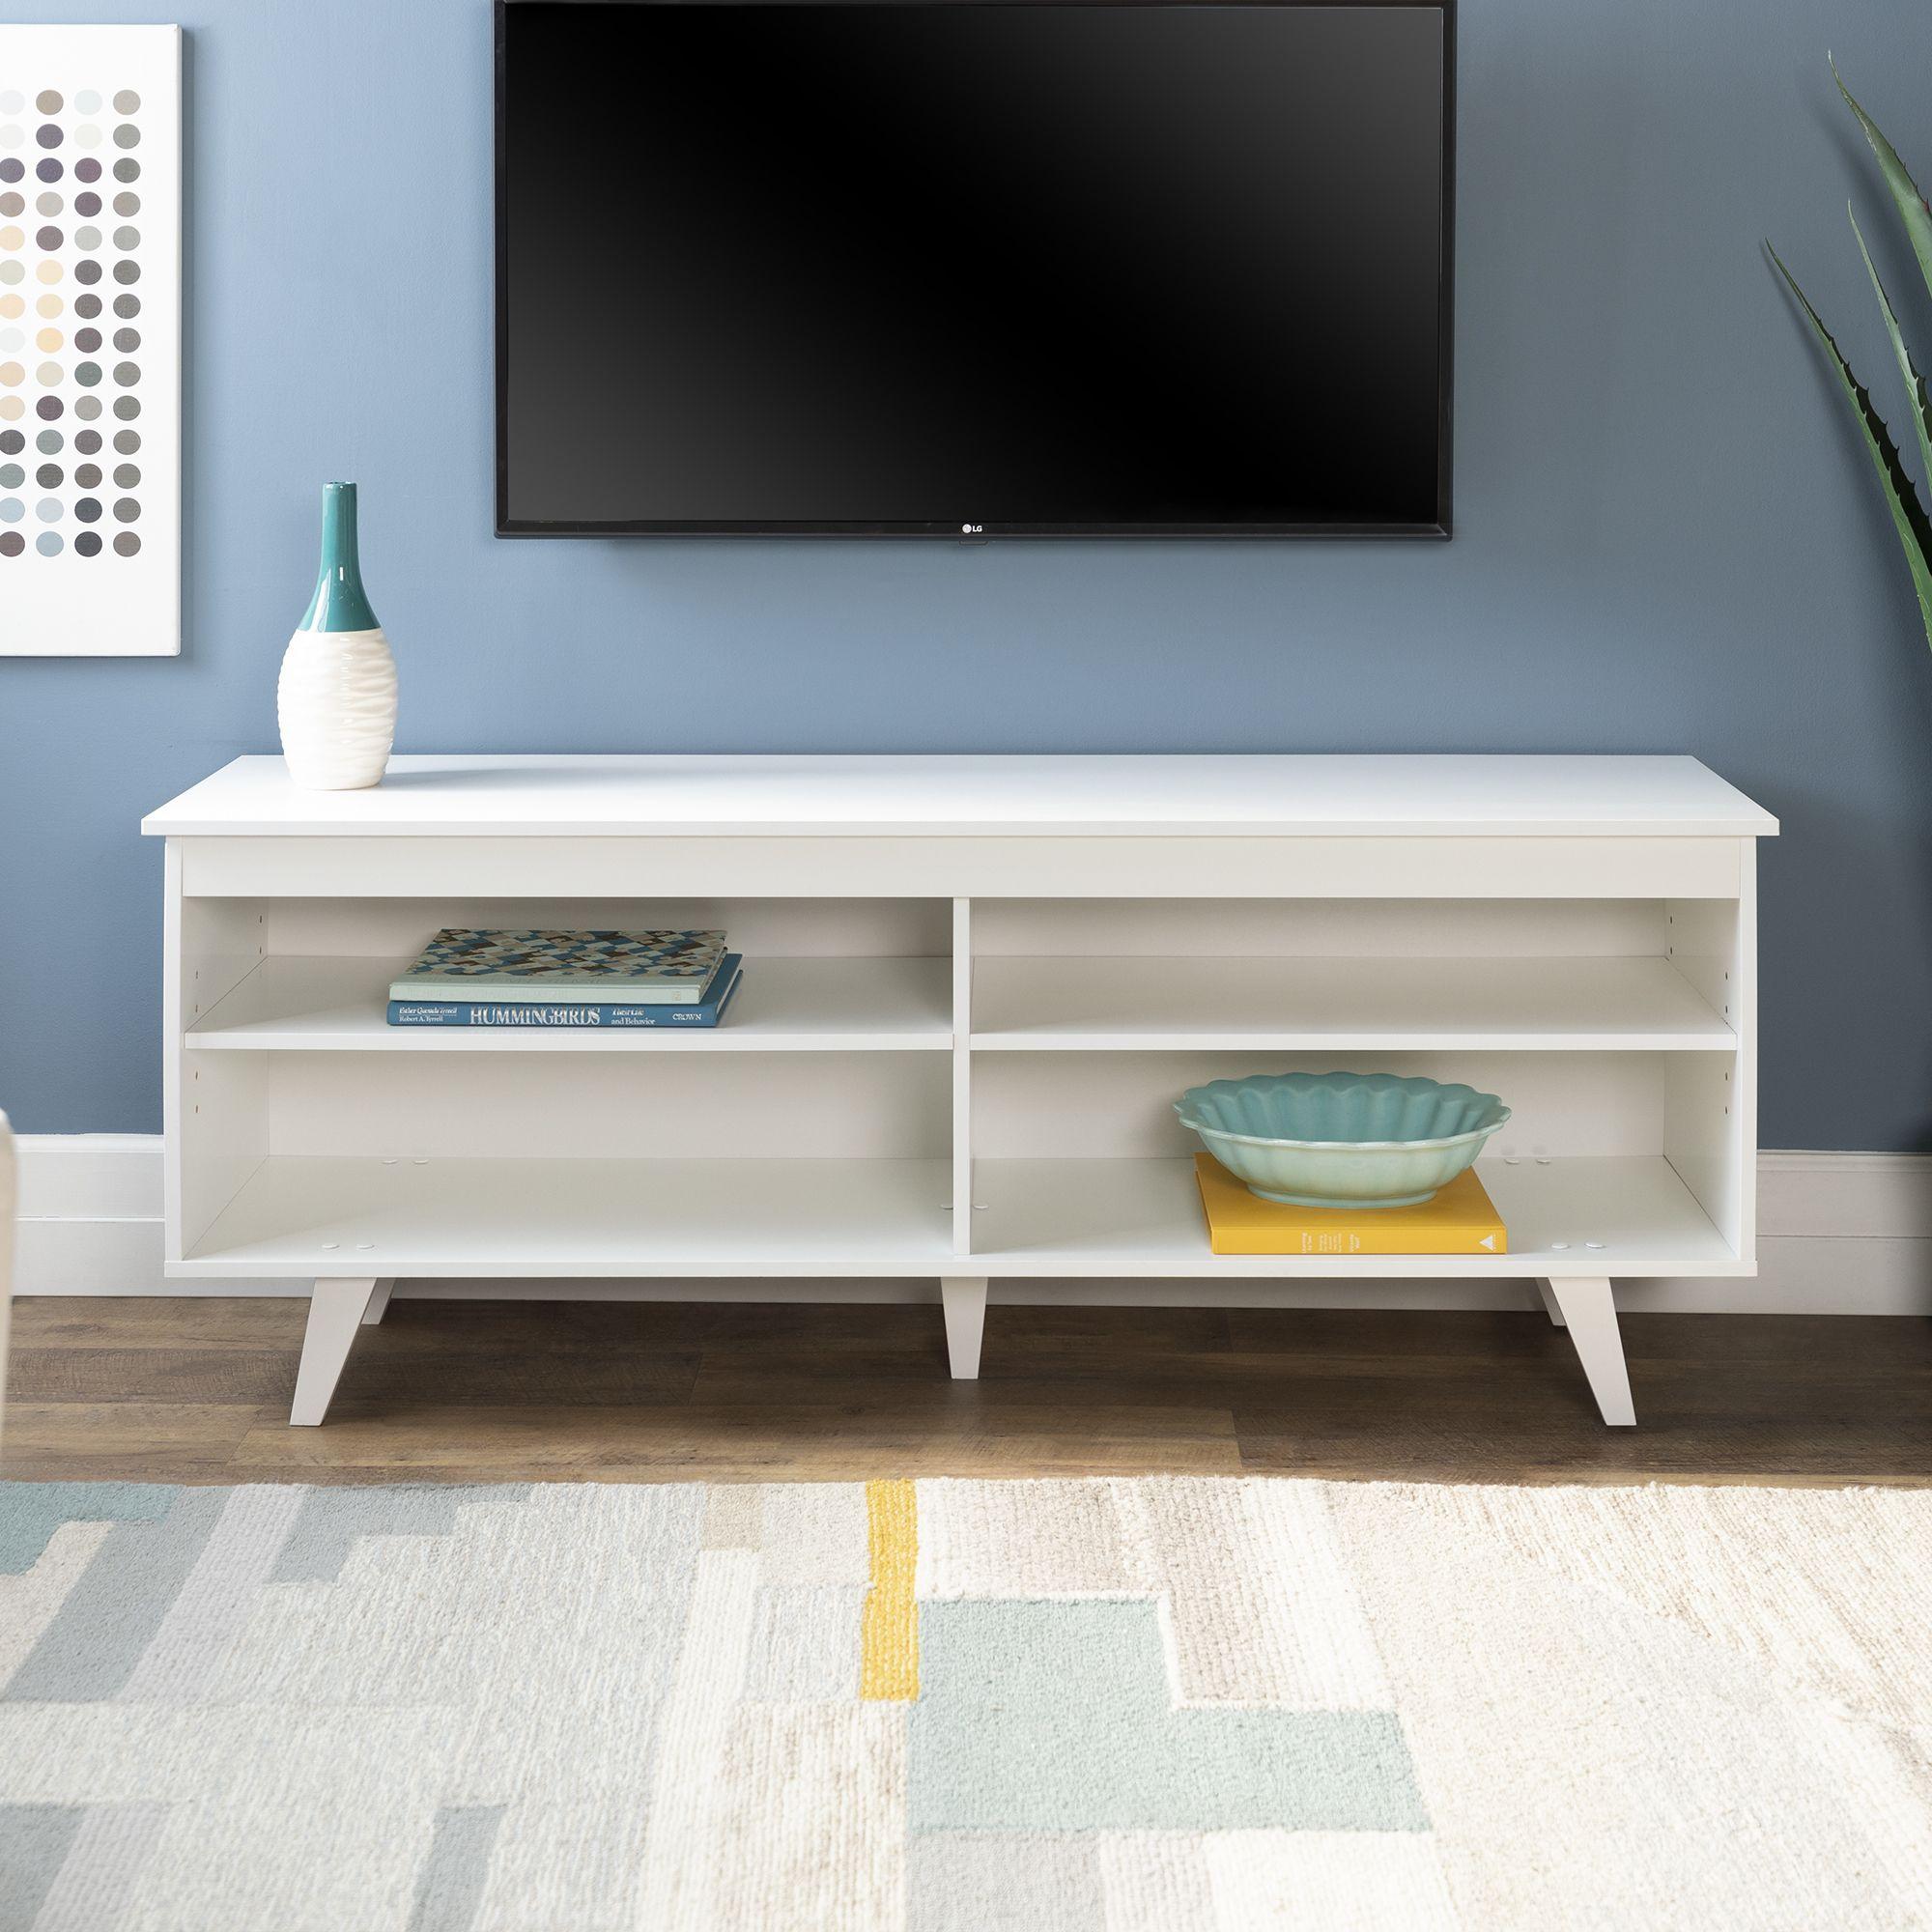 Selene Angled Leg Grey Tv Stand By Bellamy Studios Walmart Com Modern Tv Stand Mid Century Modern Tv Stand Tv Stand Console